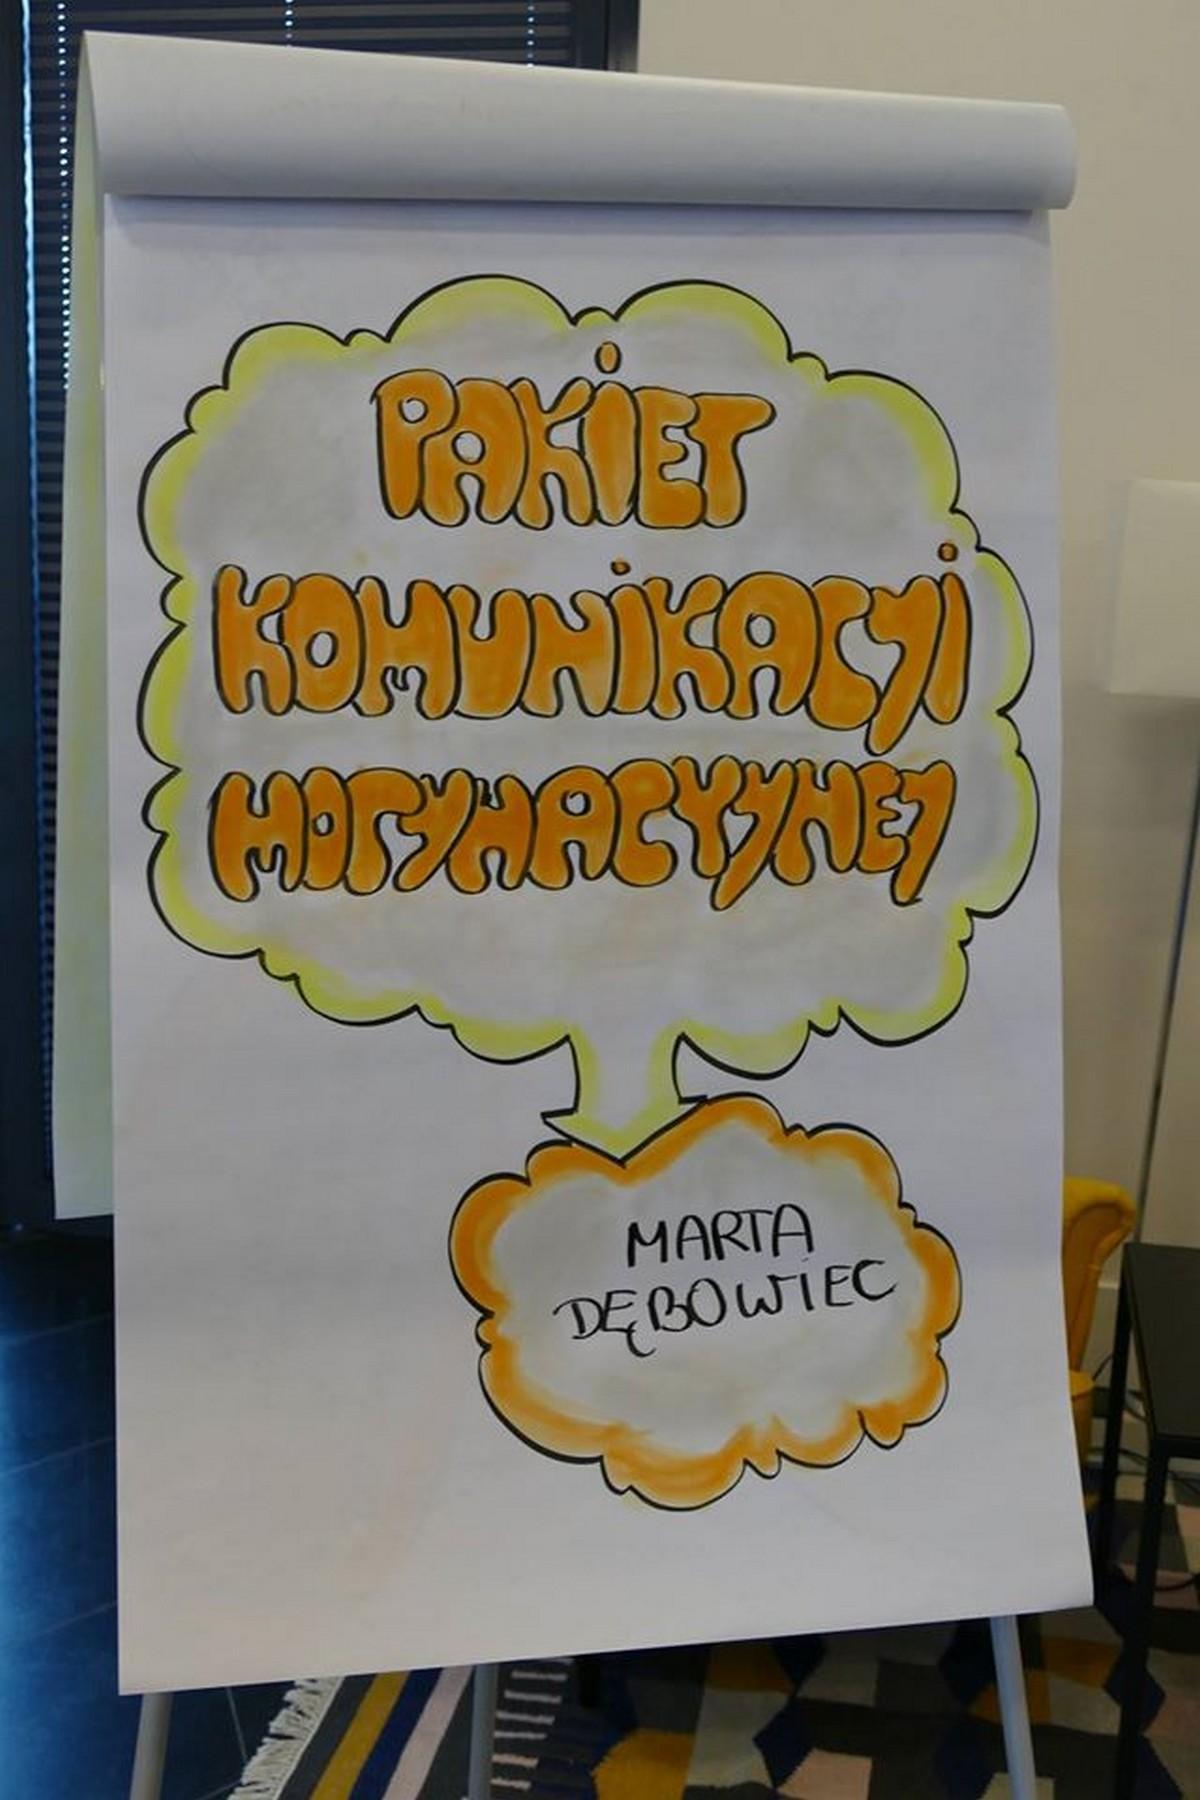 official_eleganse_strona_szkolenia_marta_debowiec_2_018